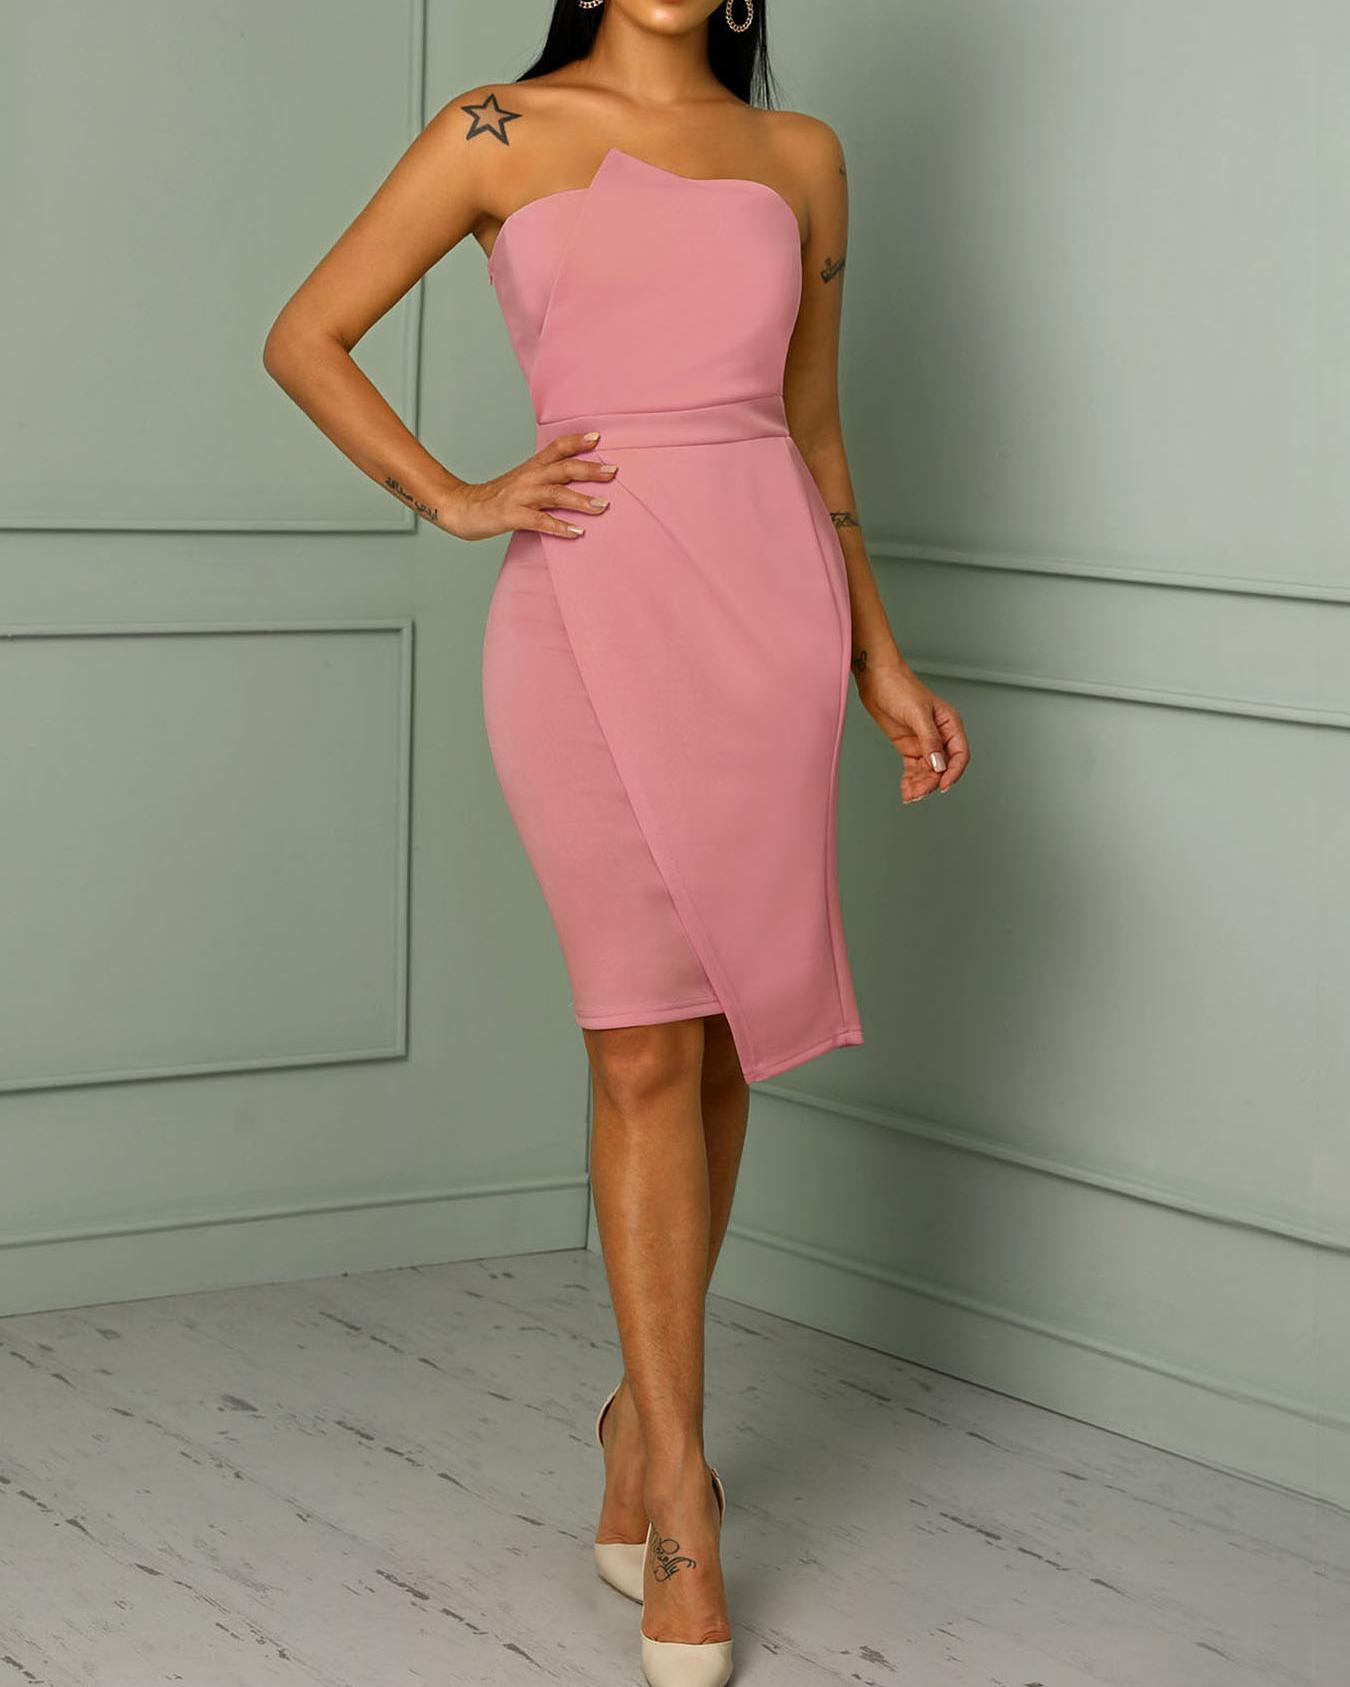 boutiquefeel / Striking Fold Front Asymmetric Dress